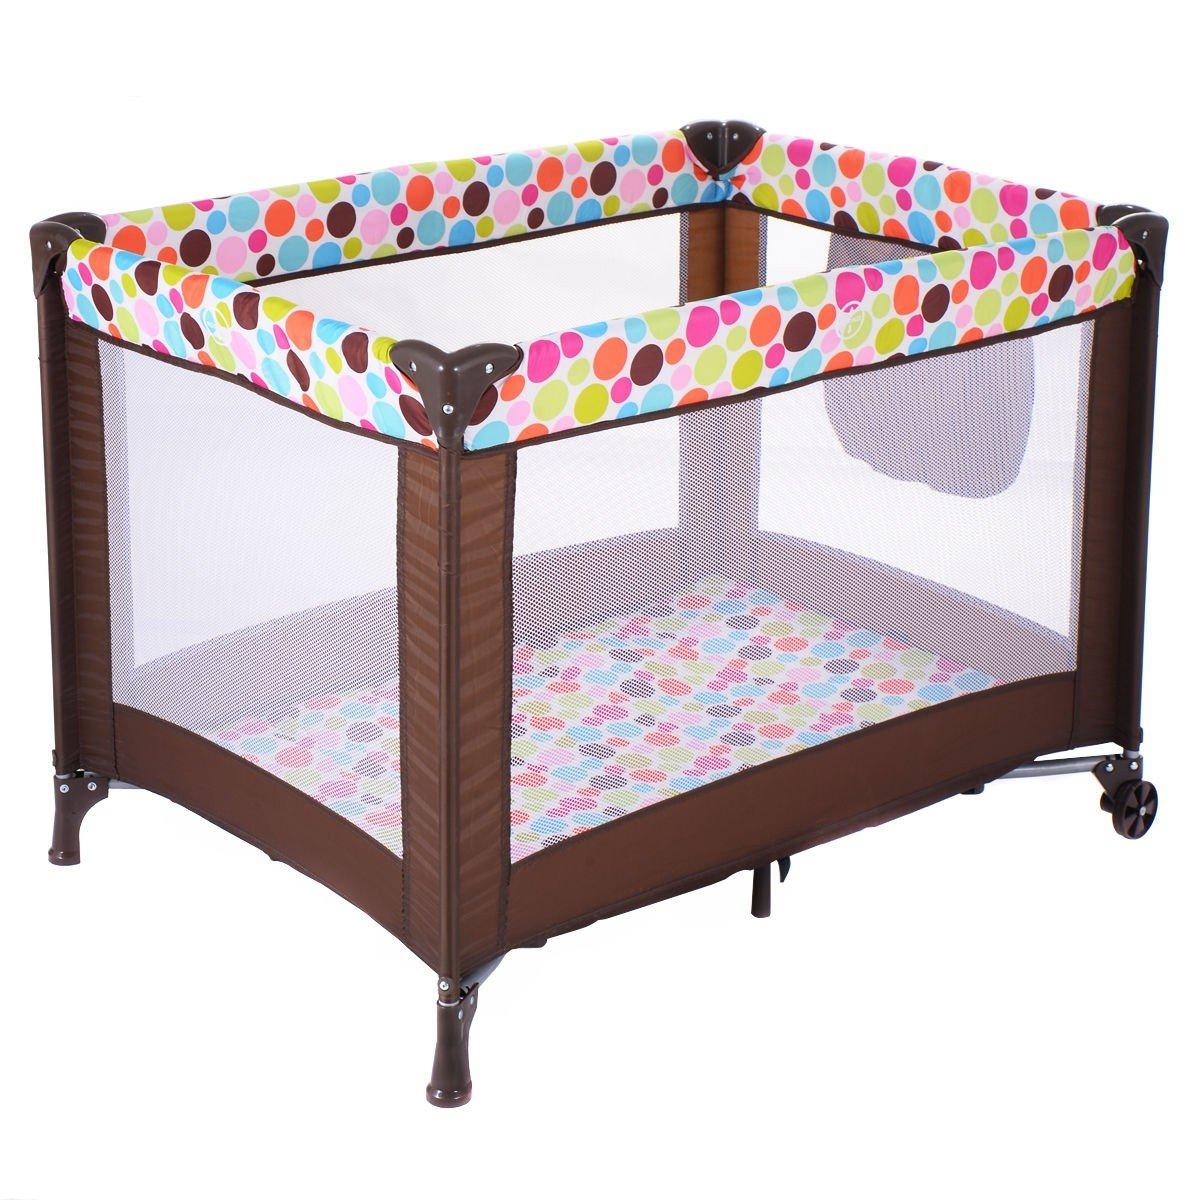 DreamHank Baby Foldable Playard Sweet Wonder Bassinet Travel Portable Bed Playpen Toddler